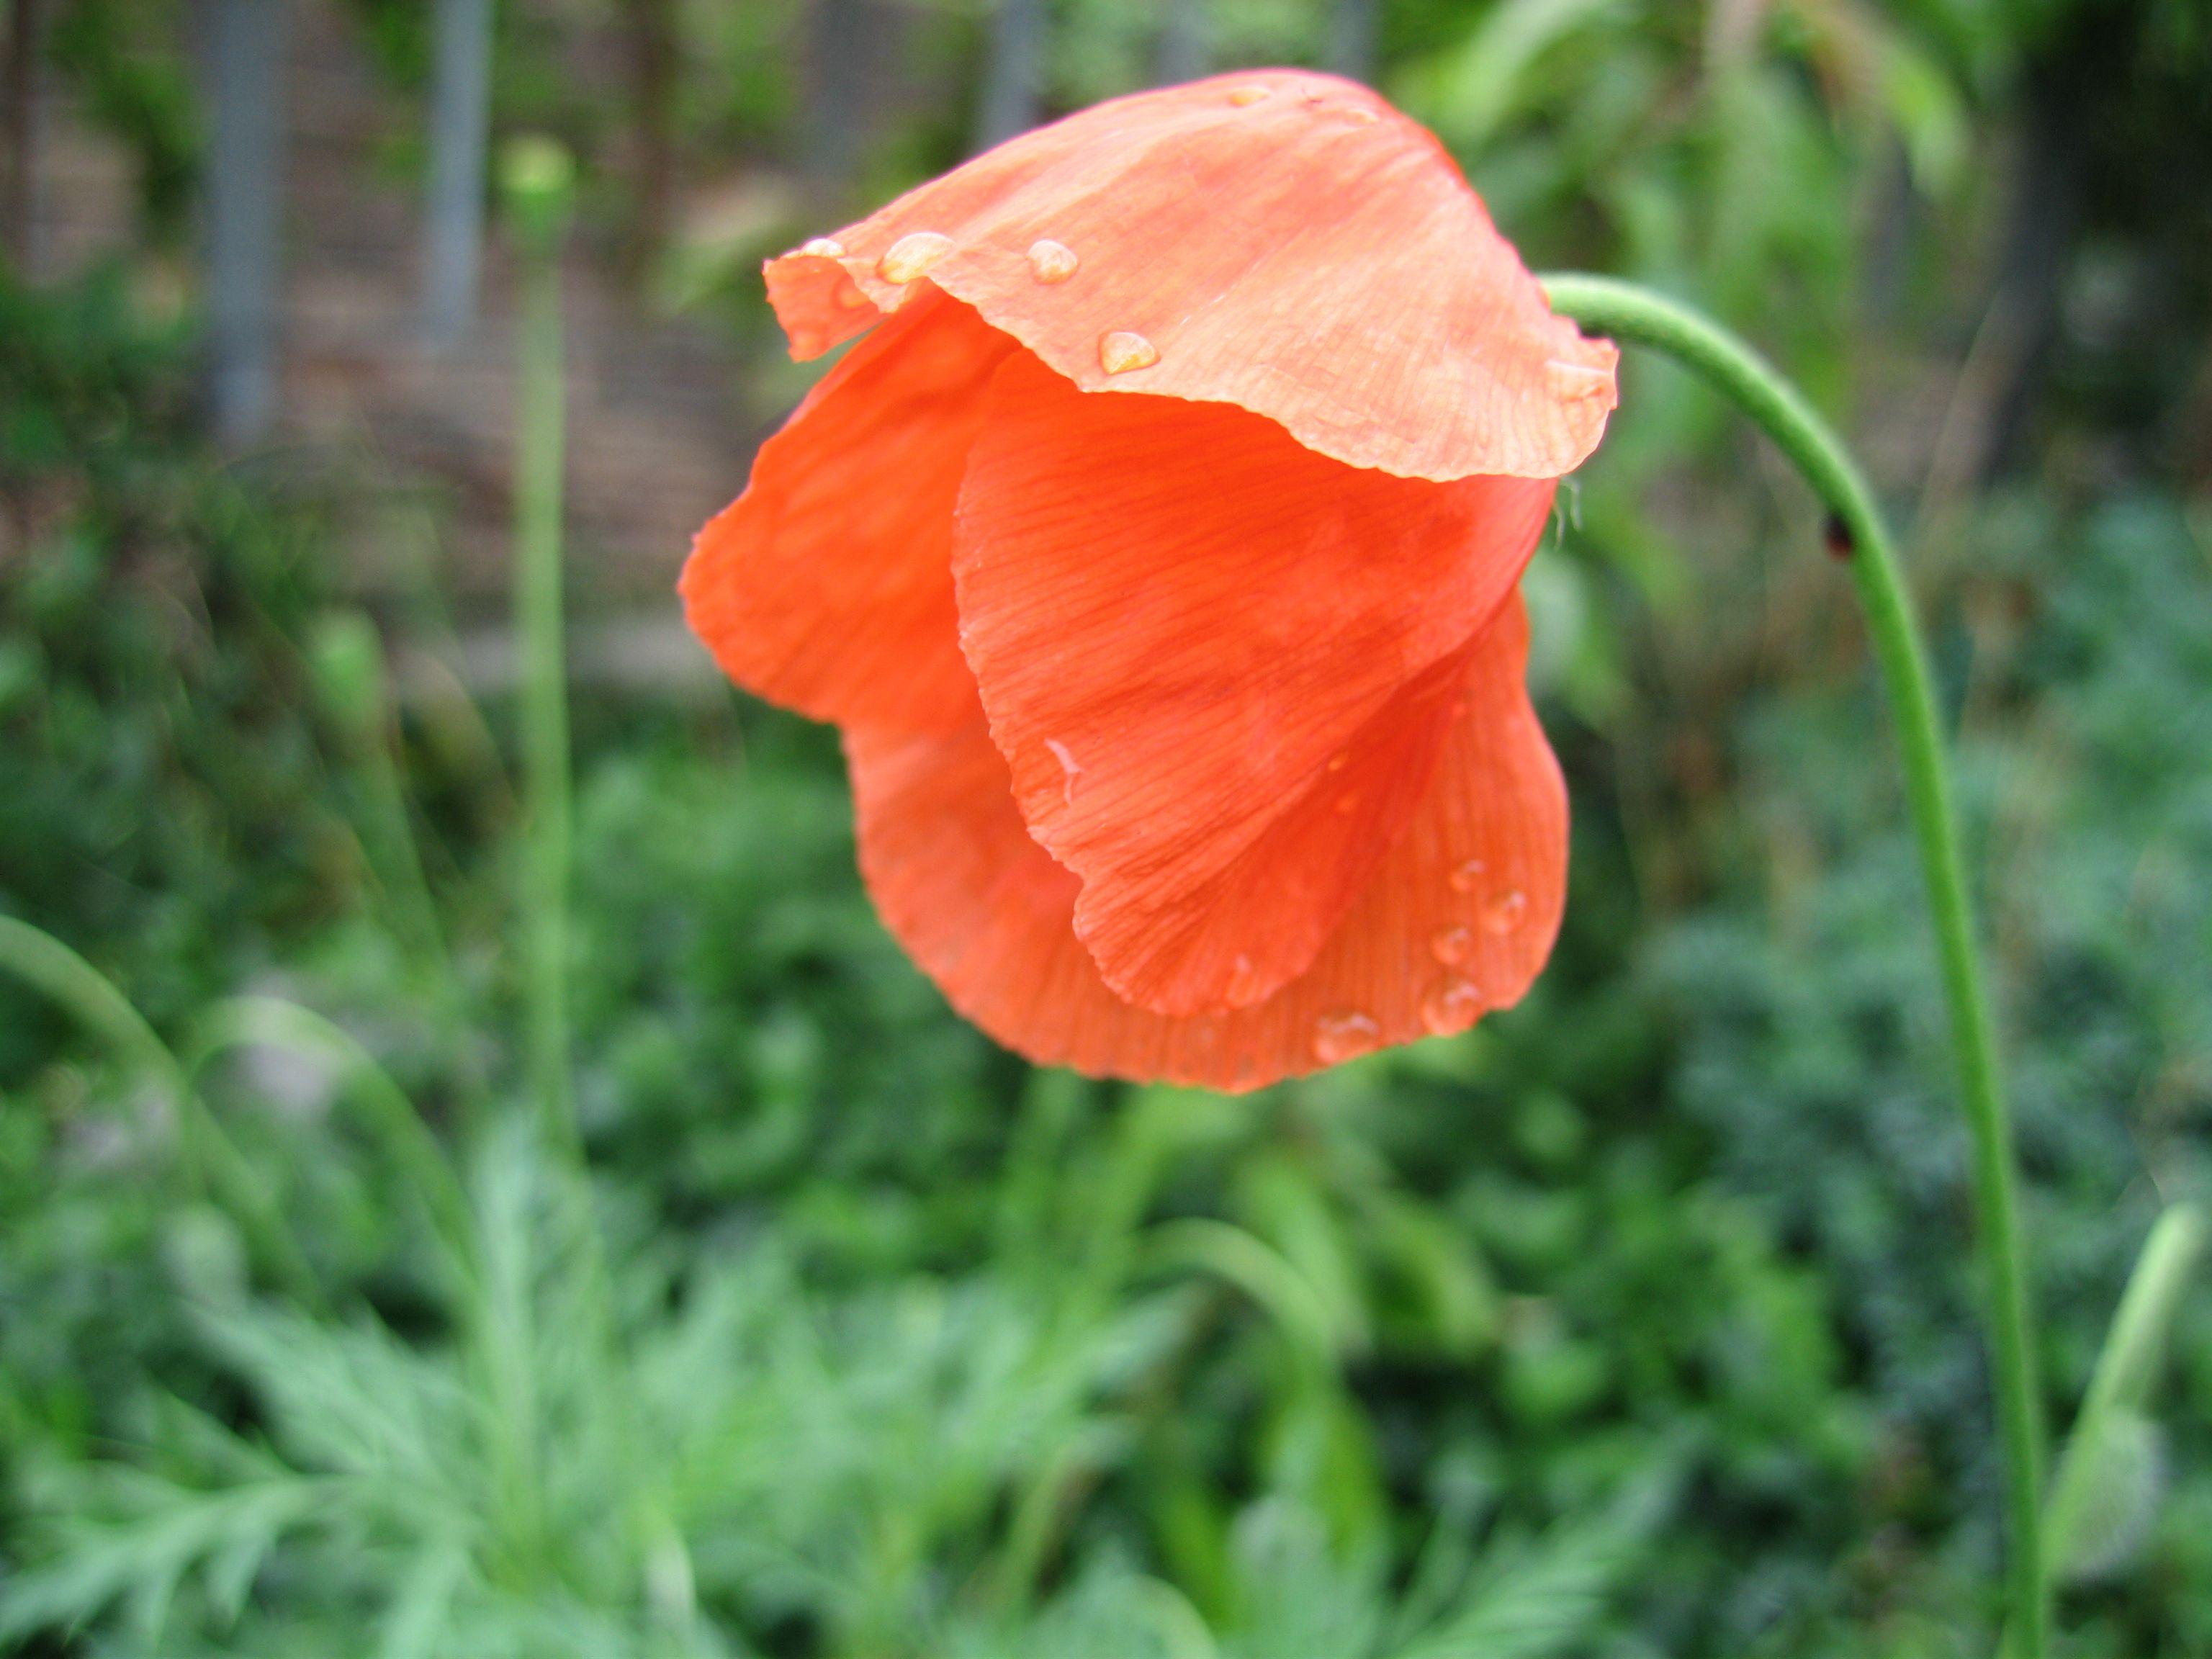 Flowers Poppy Flower Vivid Red After Flowers Bloom Warm